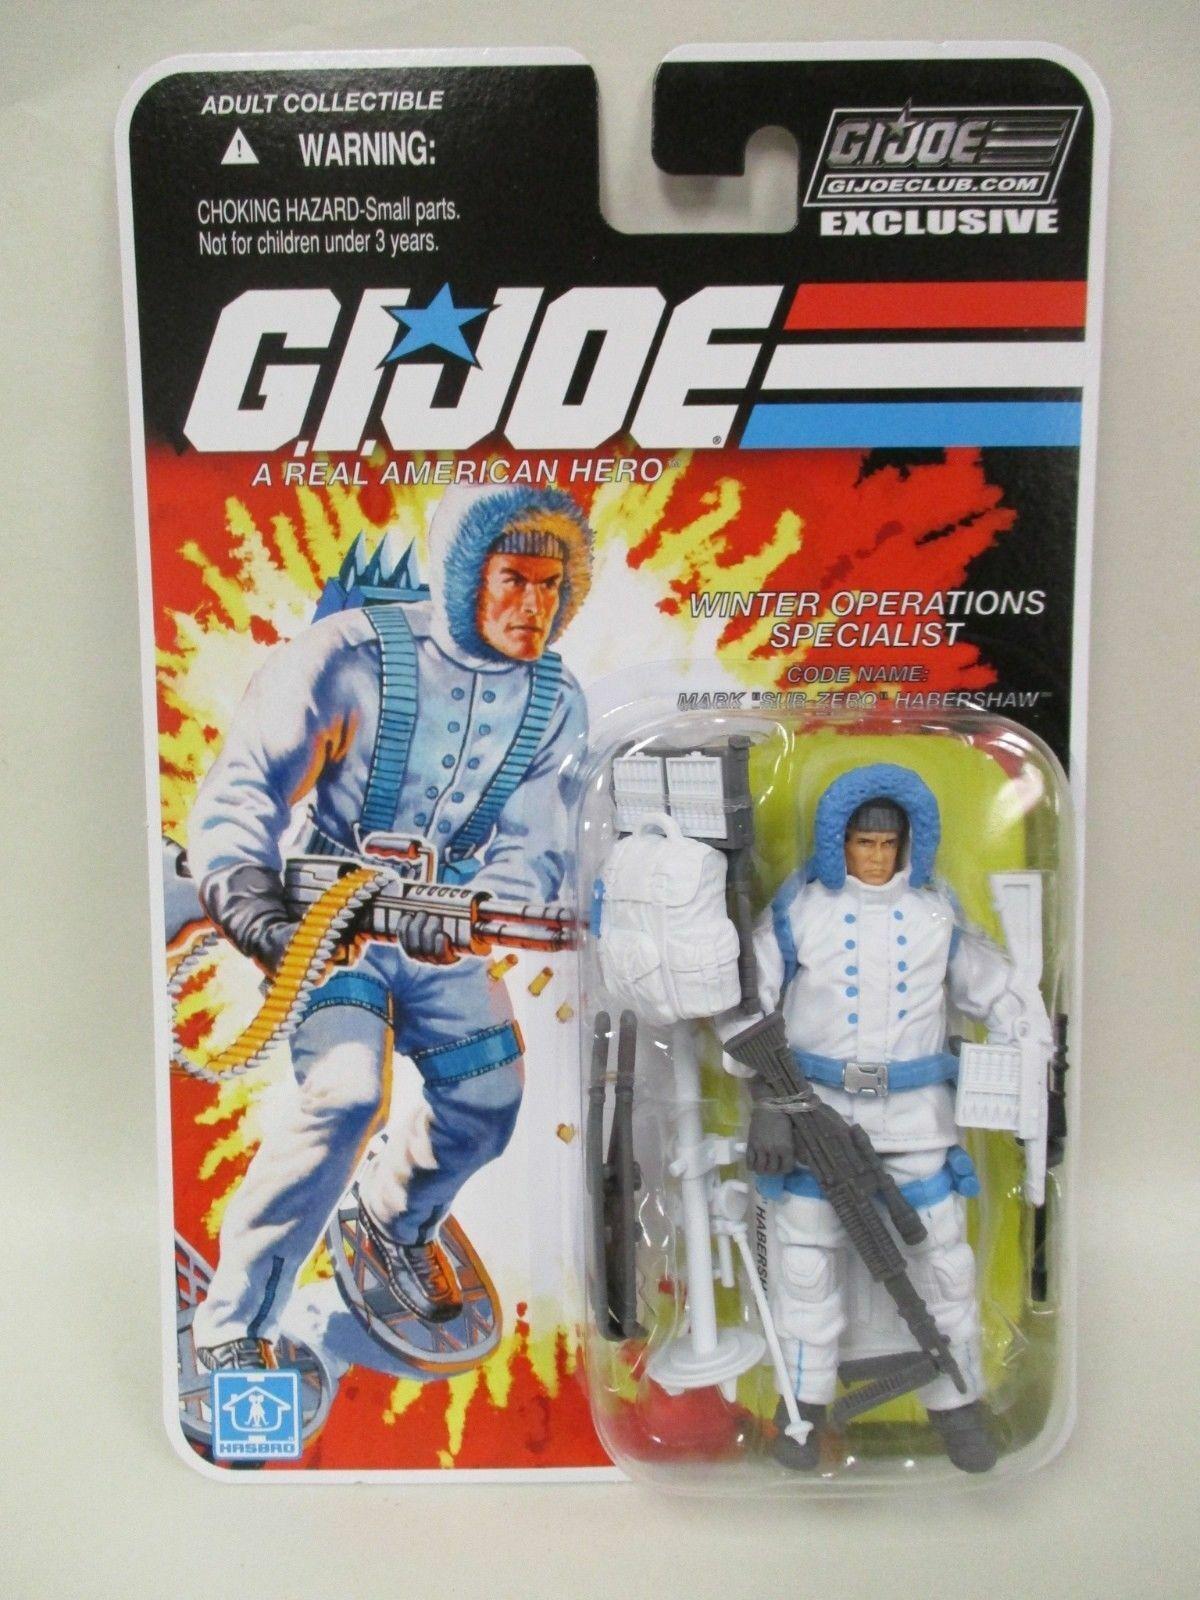 G.I.JOE EXCLUSIVE CLUB FSS 6.0  SUB-ZERO - WINTER OPERATIONS SPECIALIST